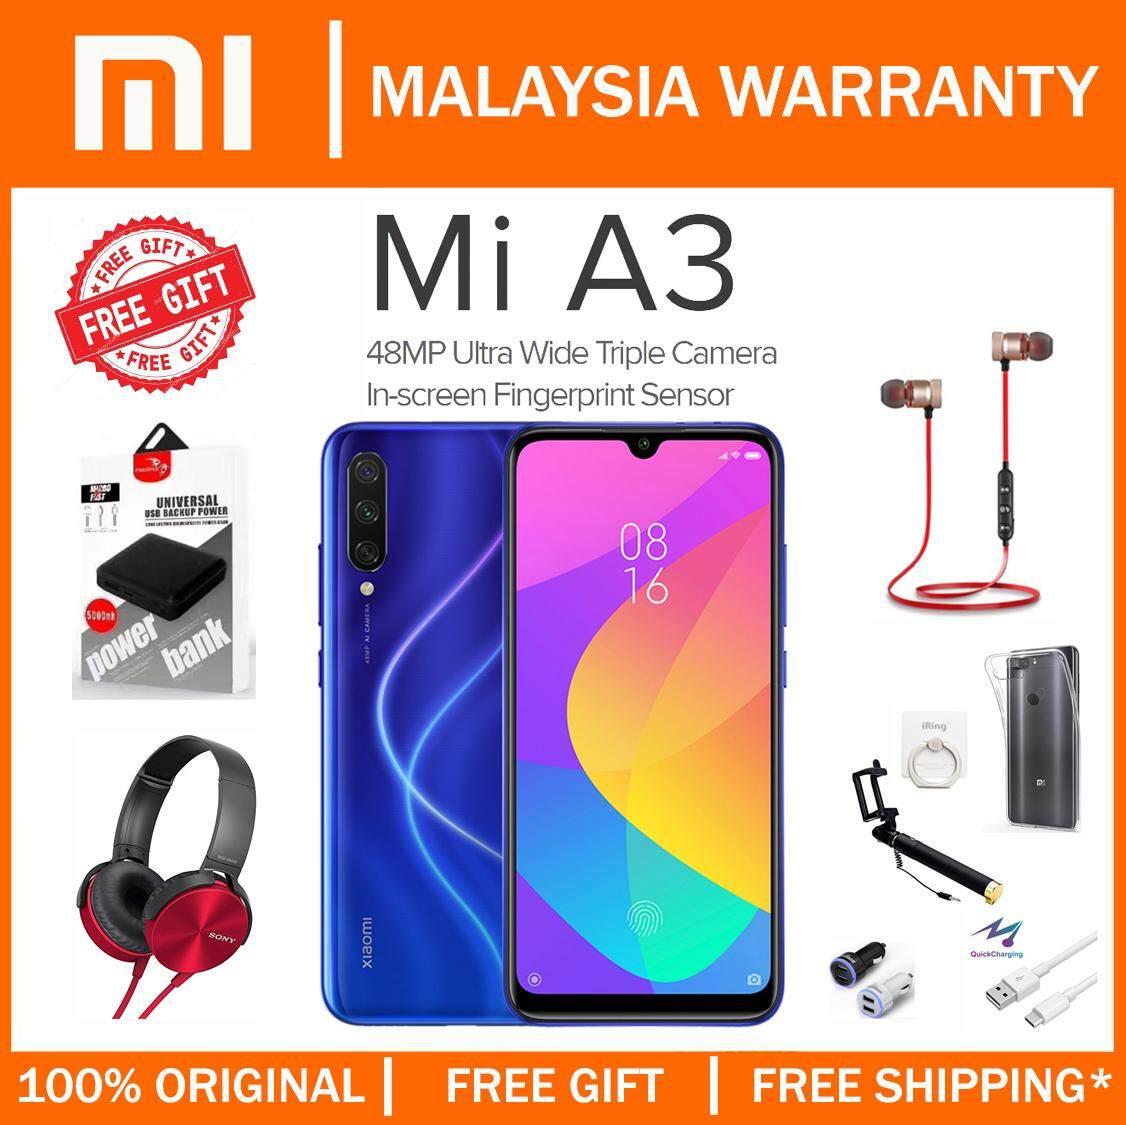 Xiaomi Mi A3 Smartphone [128GB ROM/4GB RAM] 1 Year Warranty by Xiaomi Malaysia with Free Gift worth RM299